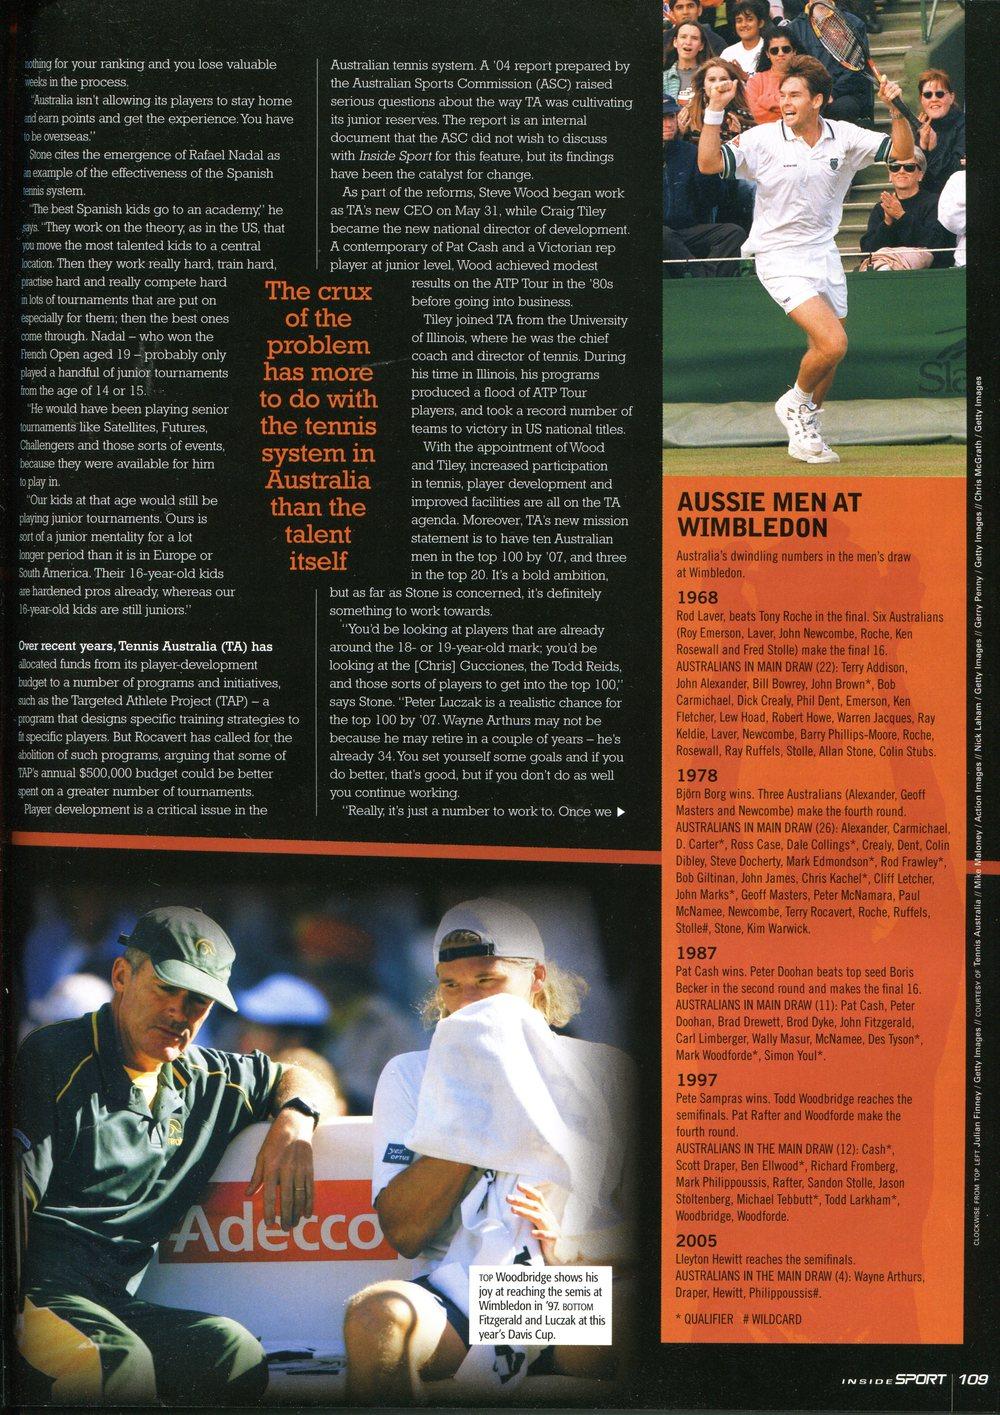 INSIDE SPORT NOVEMBER 2005 AUSTRALIAN TENNIS FUTURE FEATURE (5).jpg